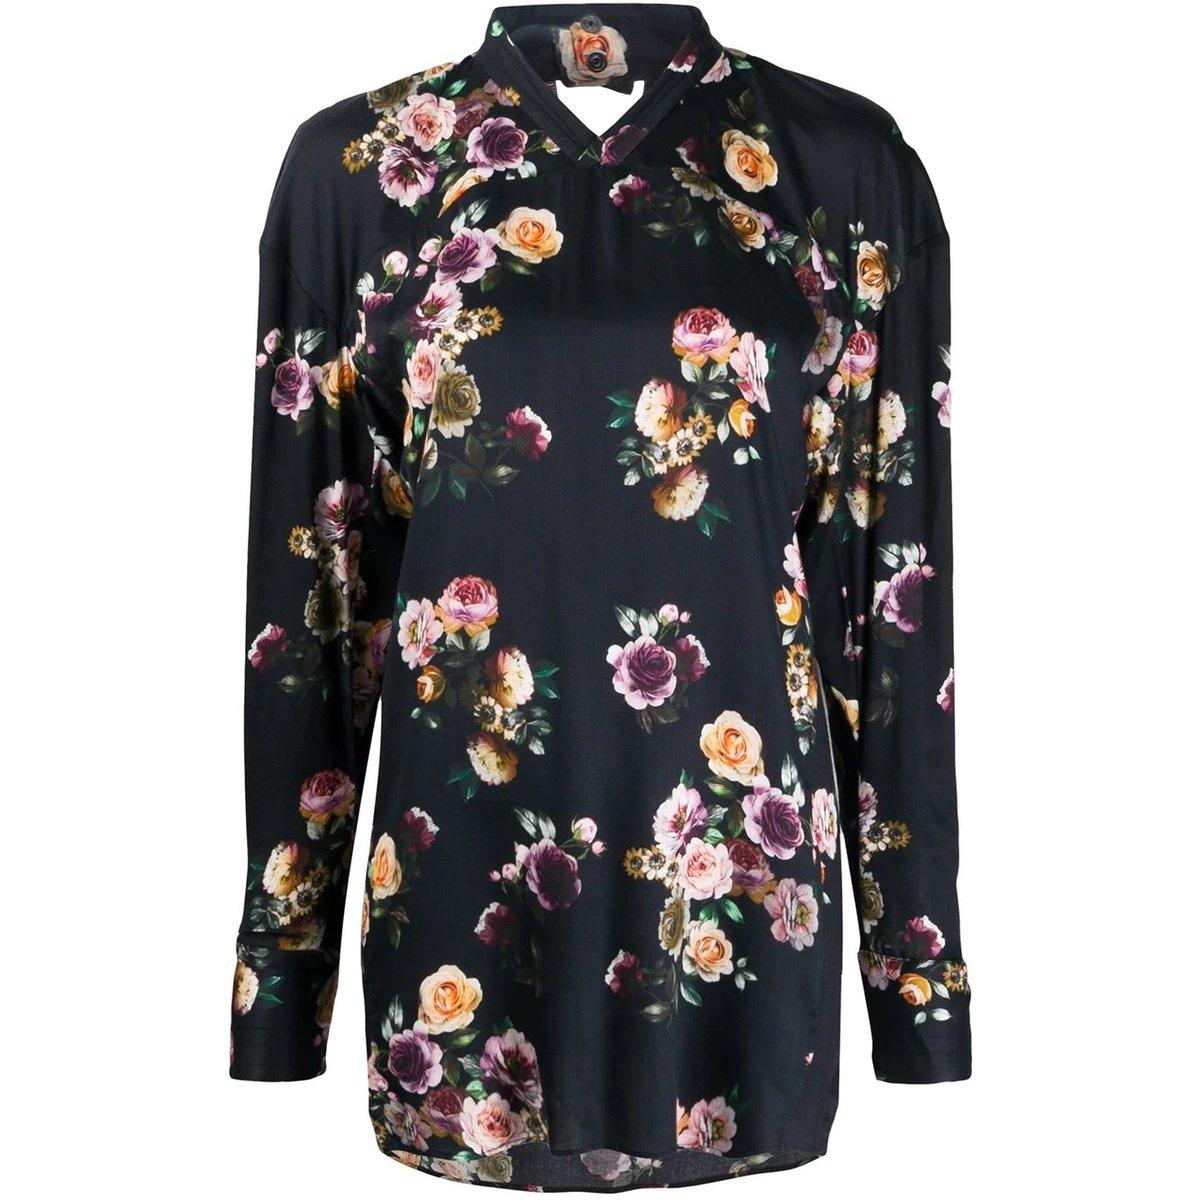 Vivienne Westwood Cocco Floral Blouse.jpg